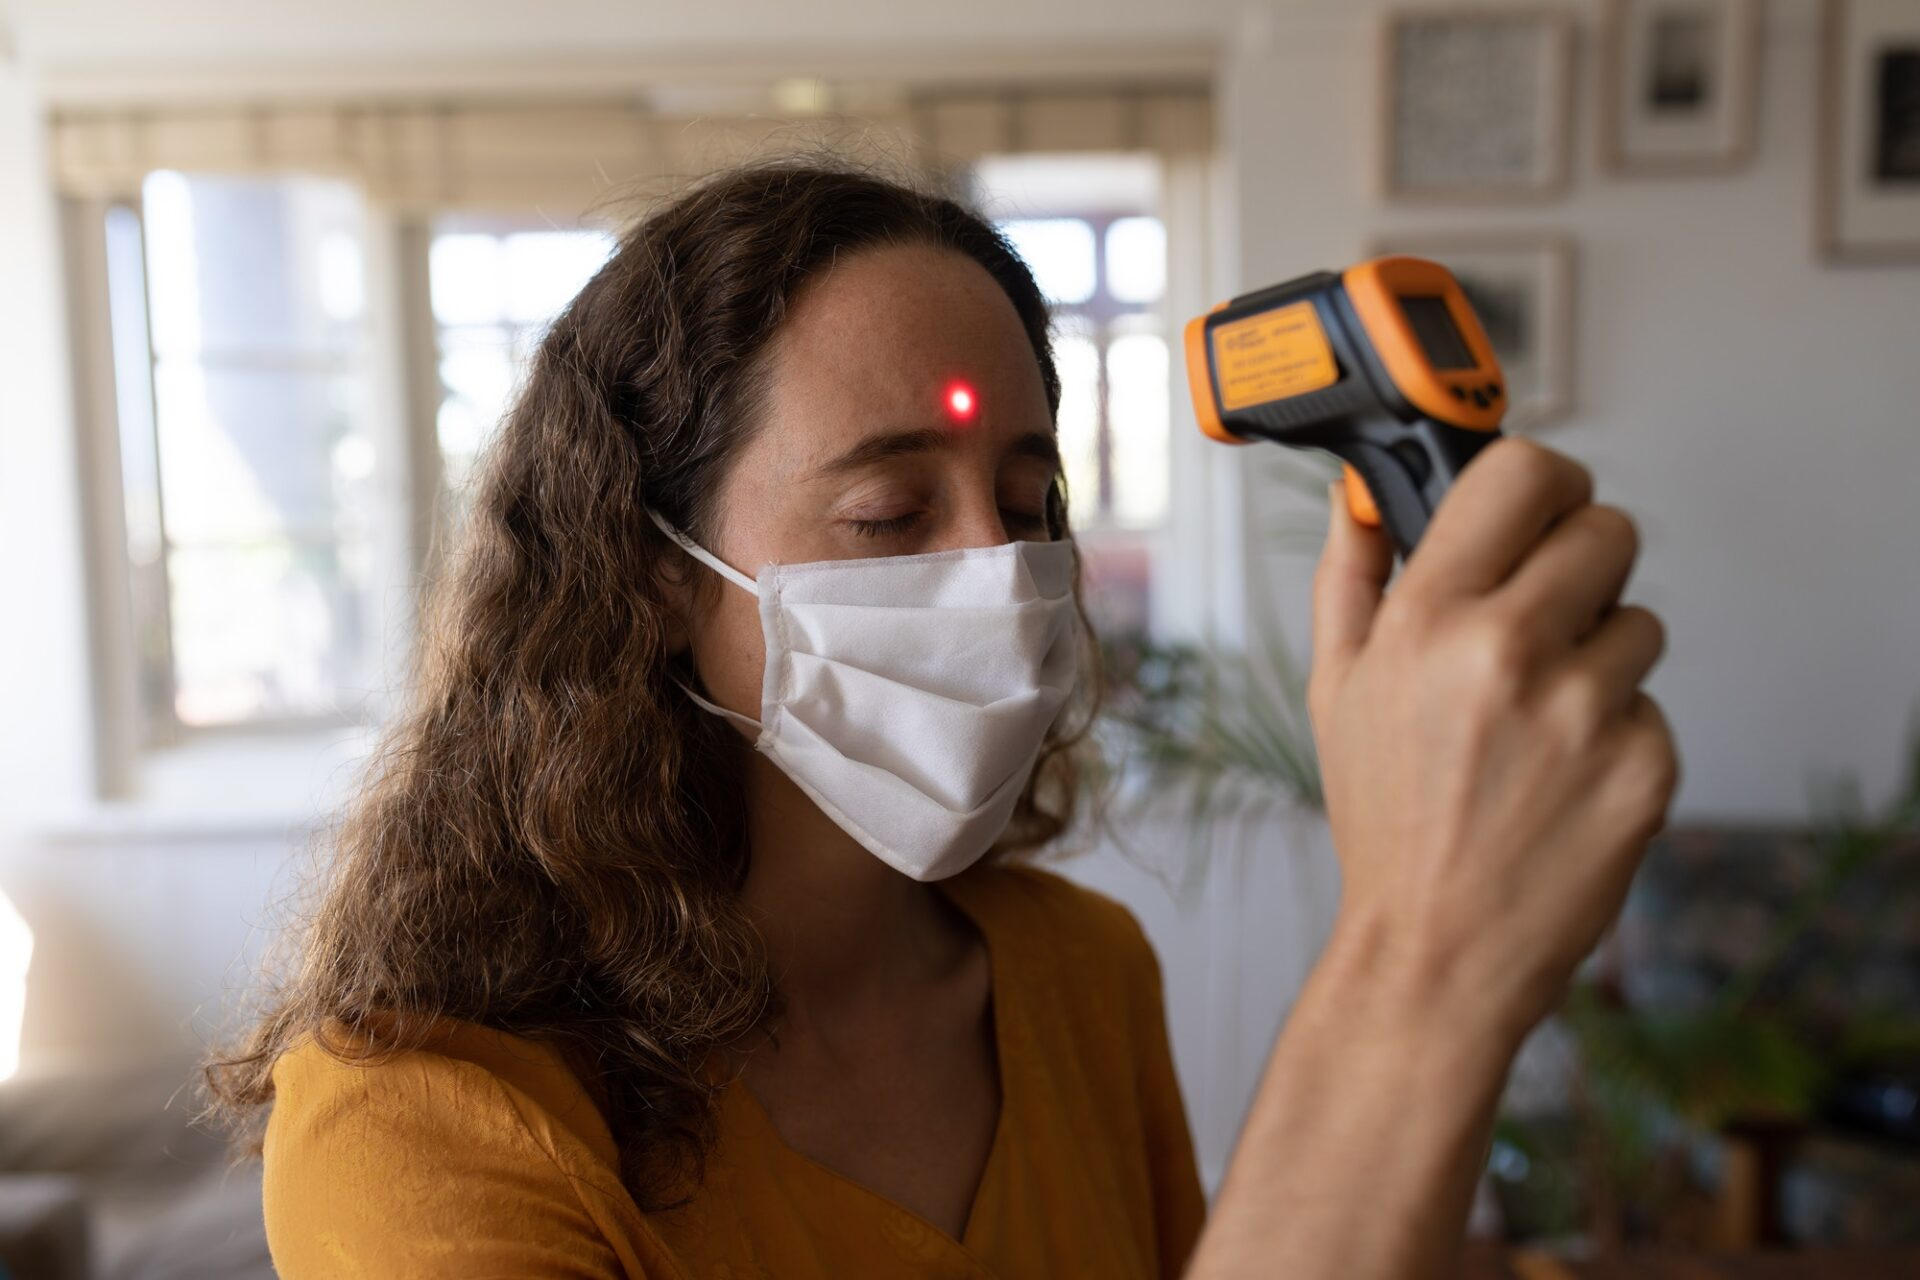 Caucasian woman self isolating at home during coronavirus covid19 pandemic